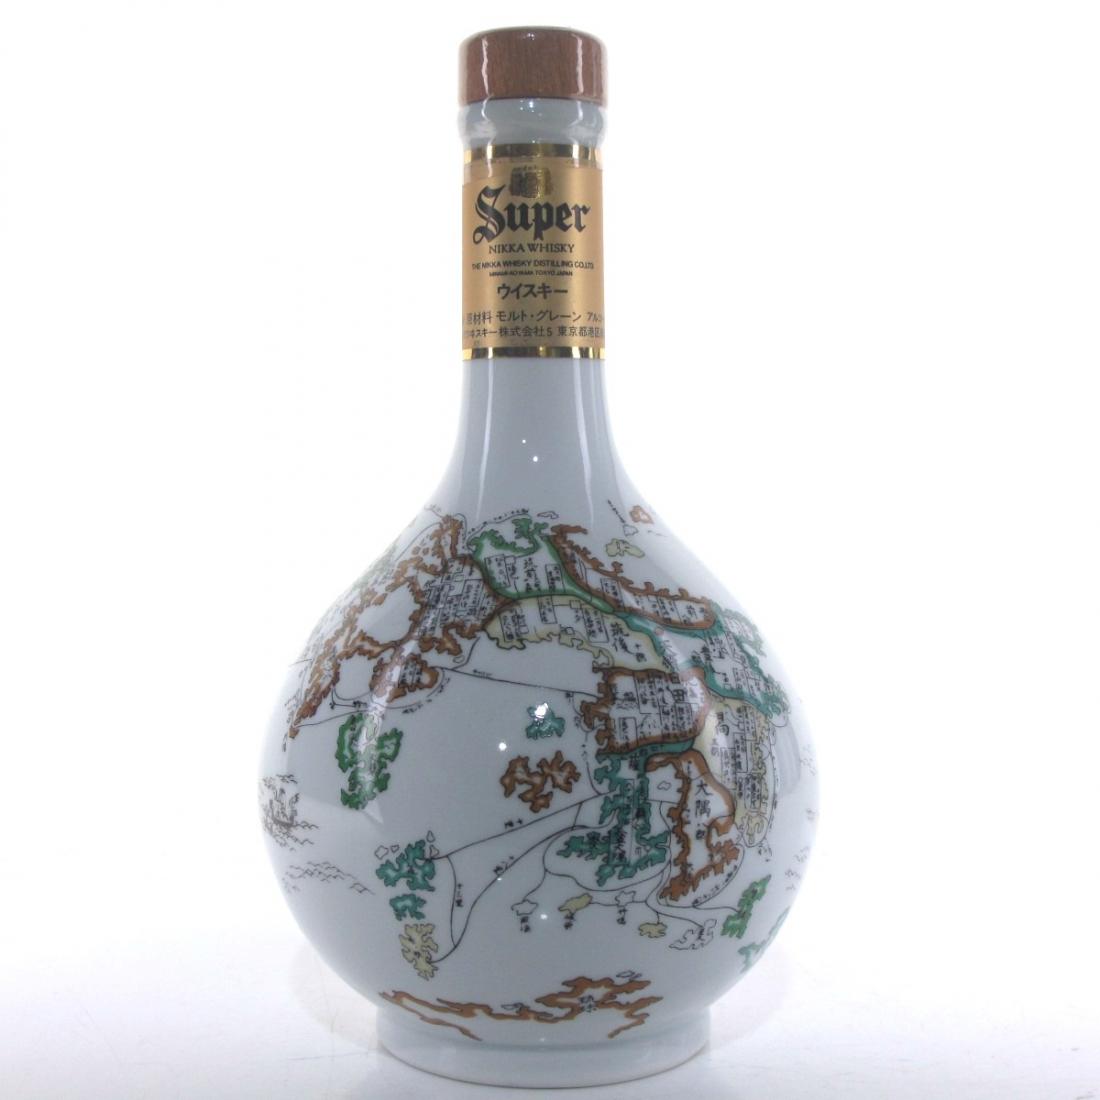 Nikka Super Whisky / Arita Ceramic Decanter 60cl